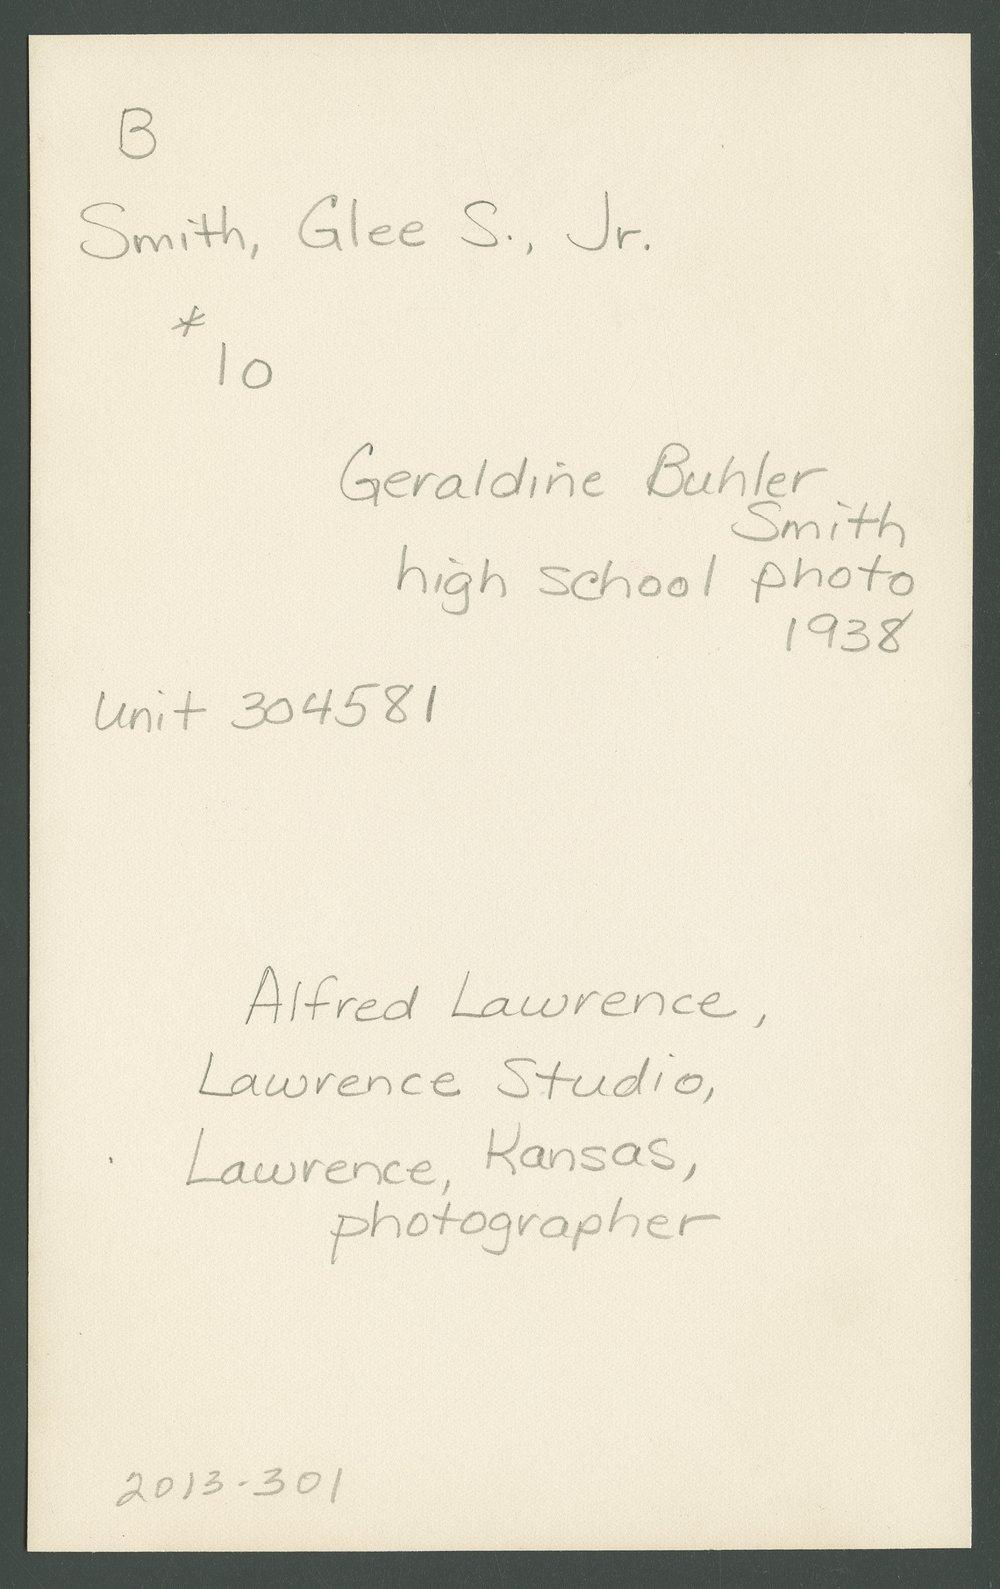 Geraldine Buhler Smith - 2